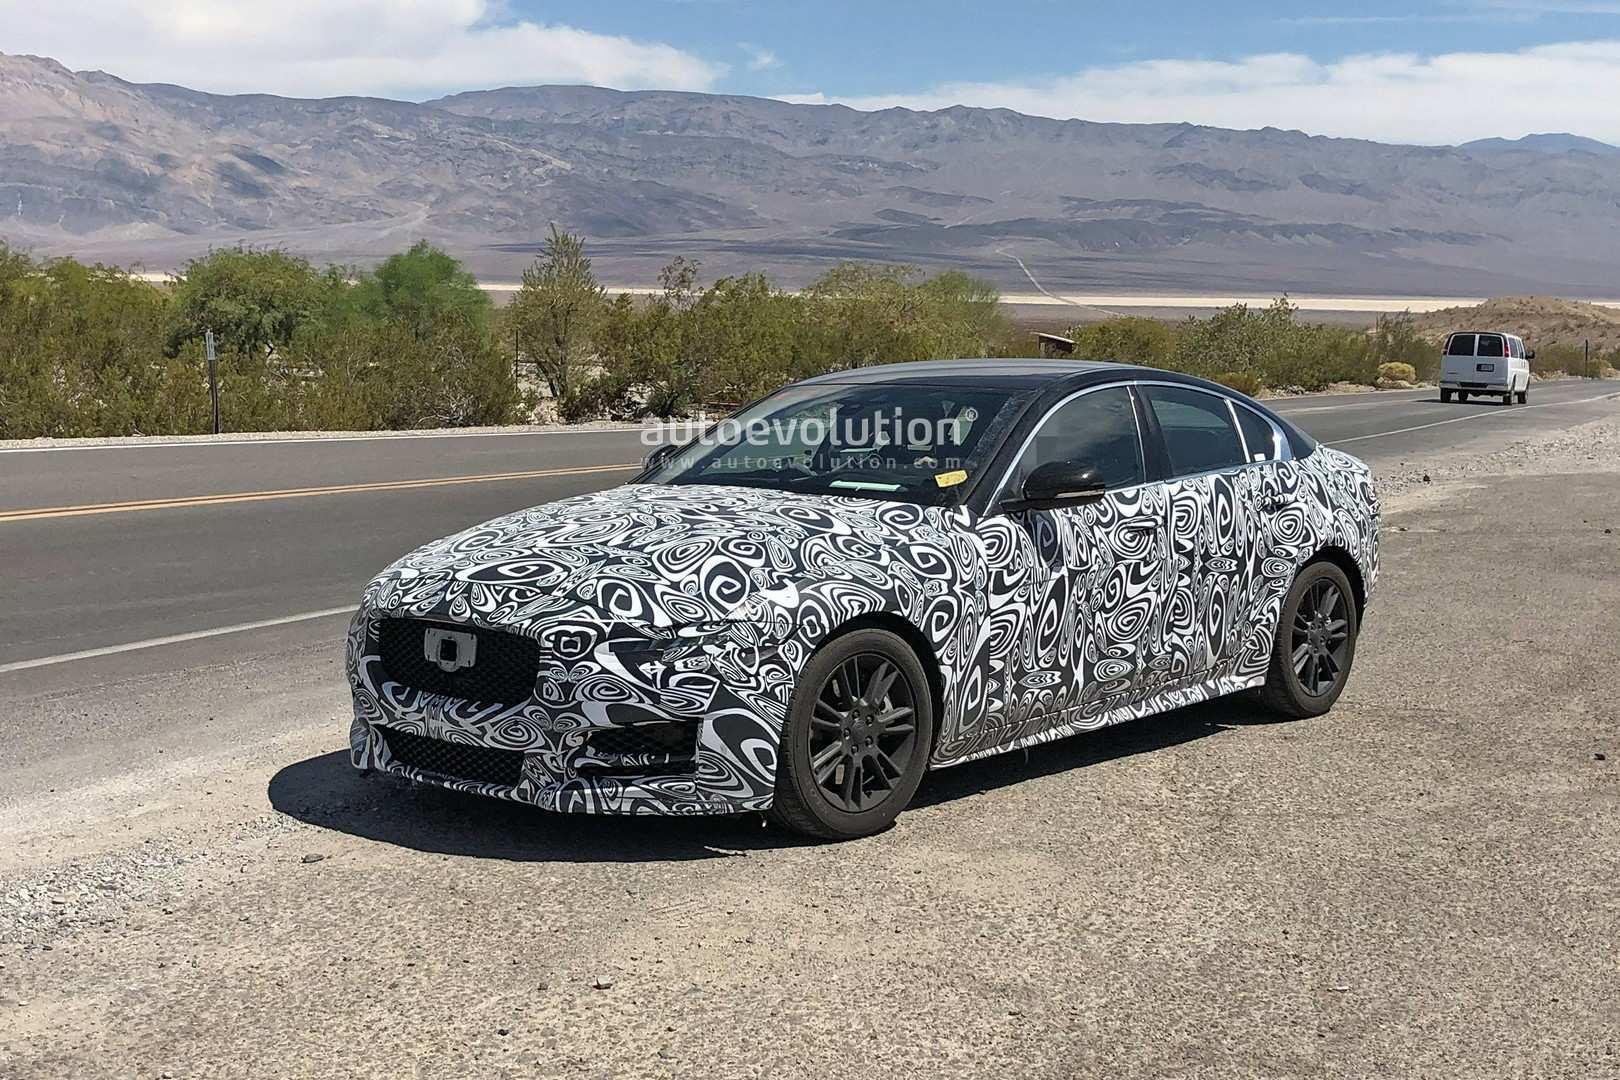 38 Concept of Jaguar Xe Facelift 2020 Exterior and Interior with Jaguar Xe Facelift 2020